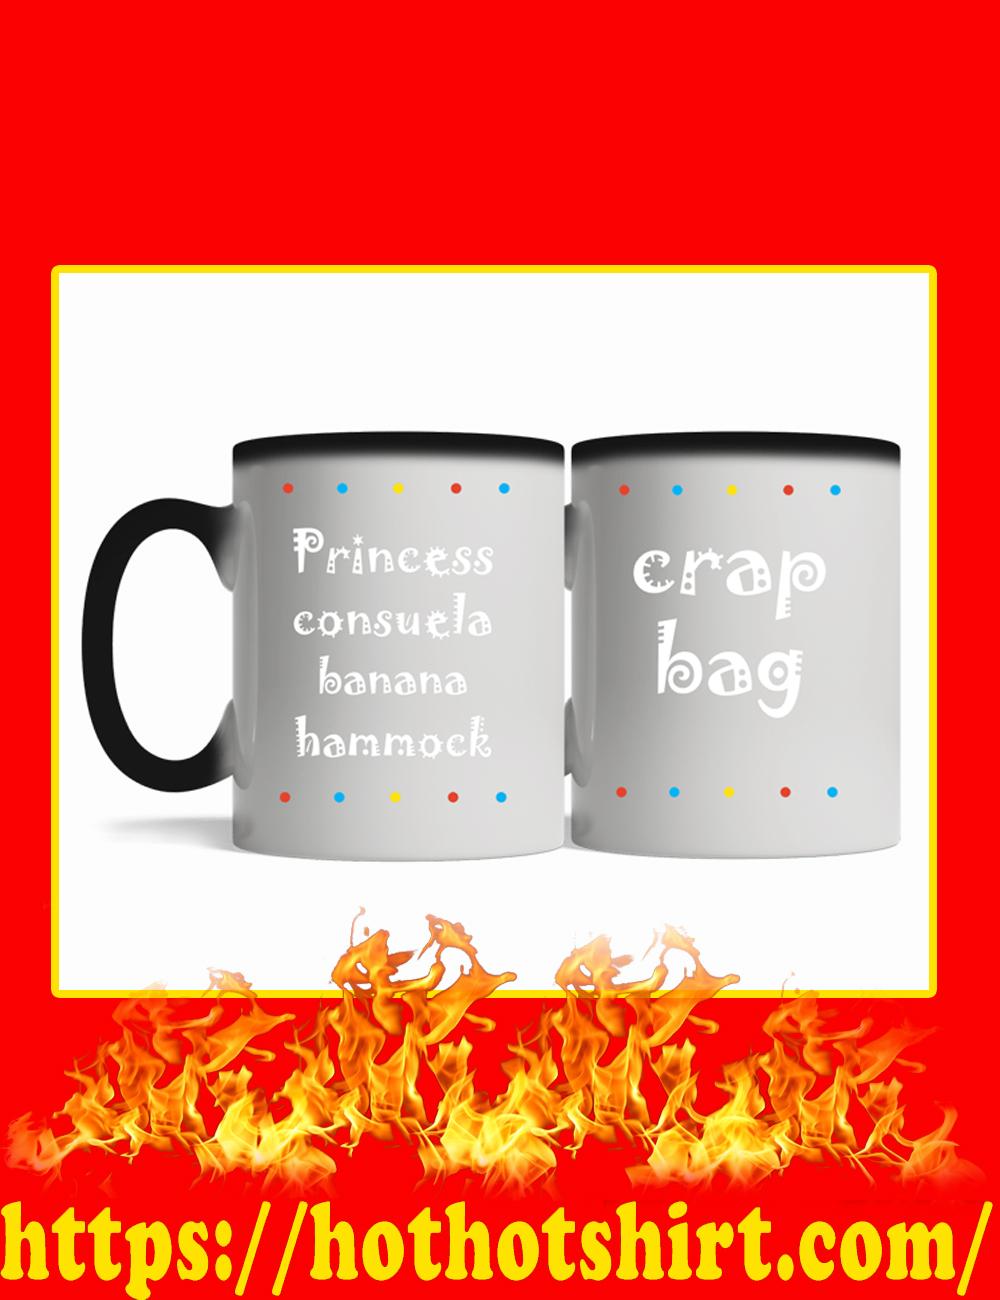 Princess Consuela Banana Hammock Crap Bag Magic Mug